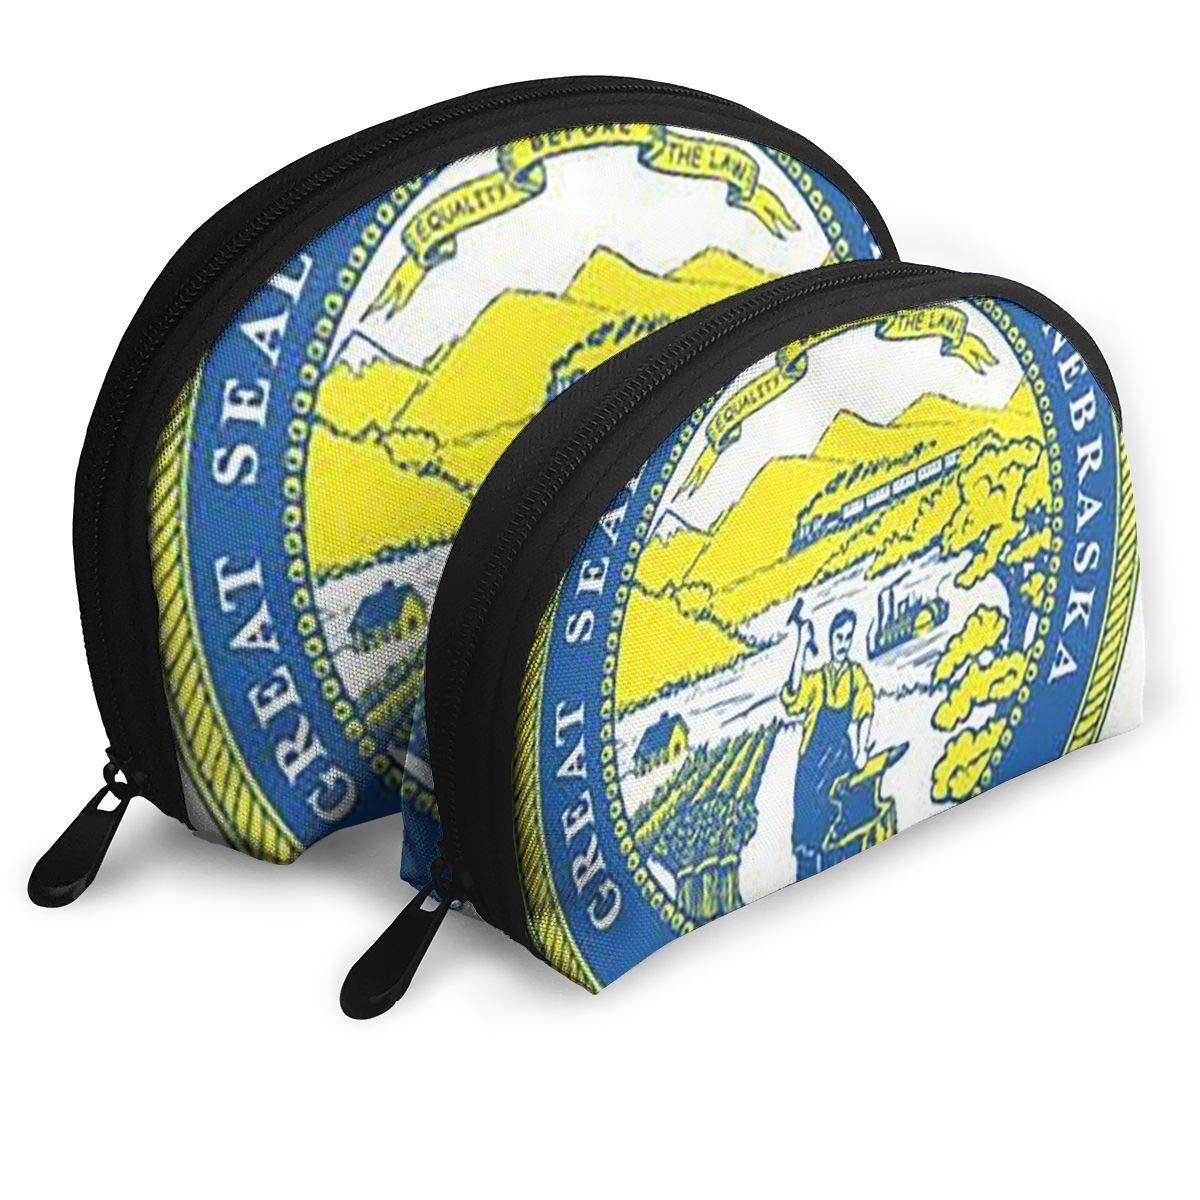 Half Moon Cosmetic Beauty Bag,Nebraska Handy Cosmetic Pouch Clutch Makeup Bag For Women Girls